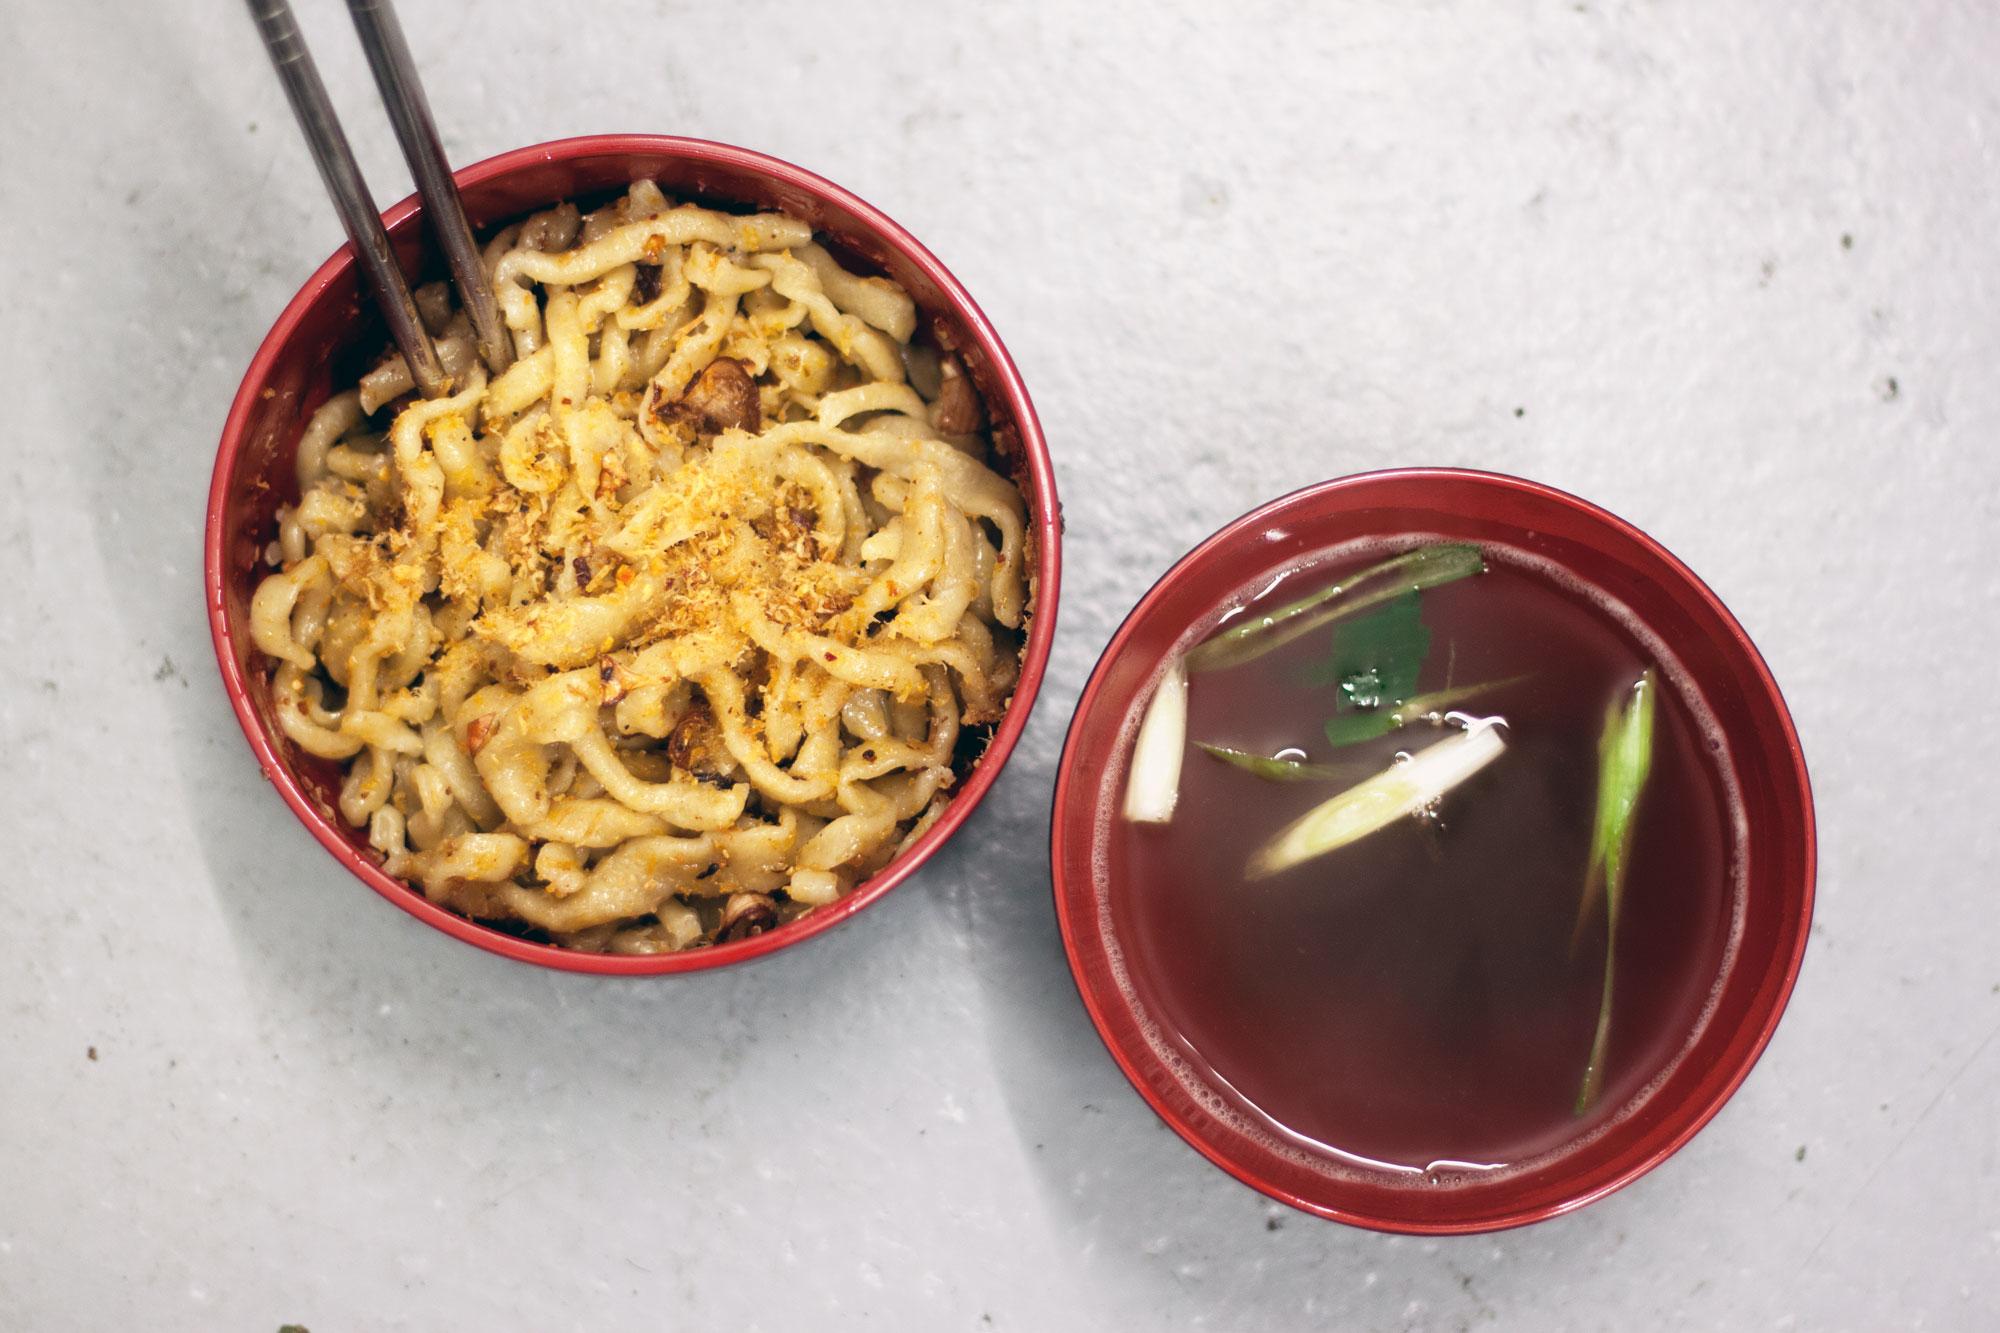 CNYhong-kong-noodles-and-broth